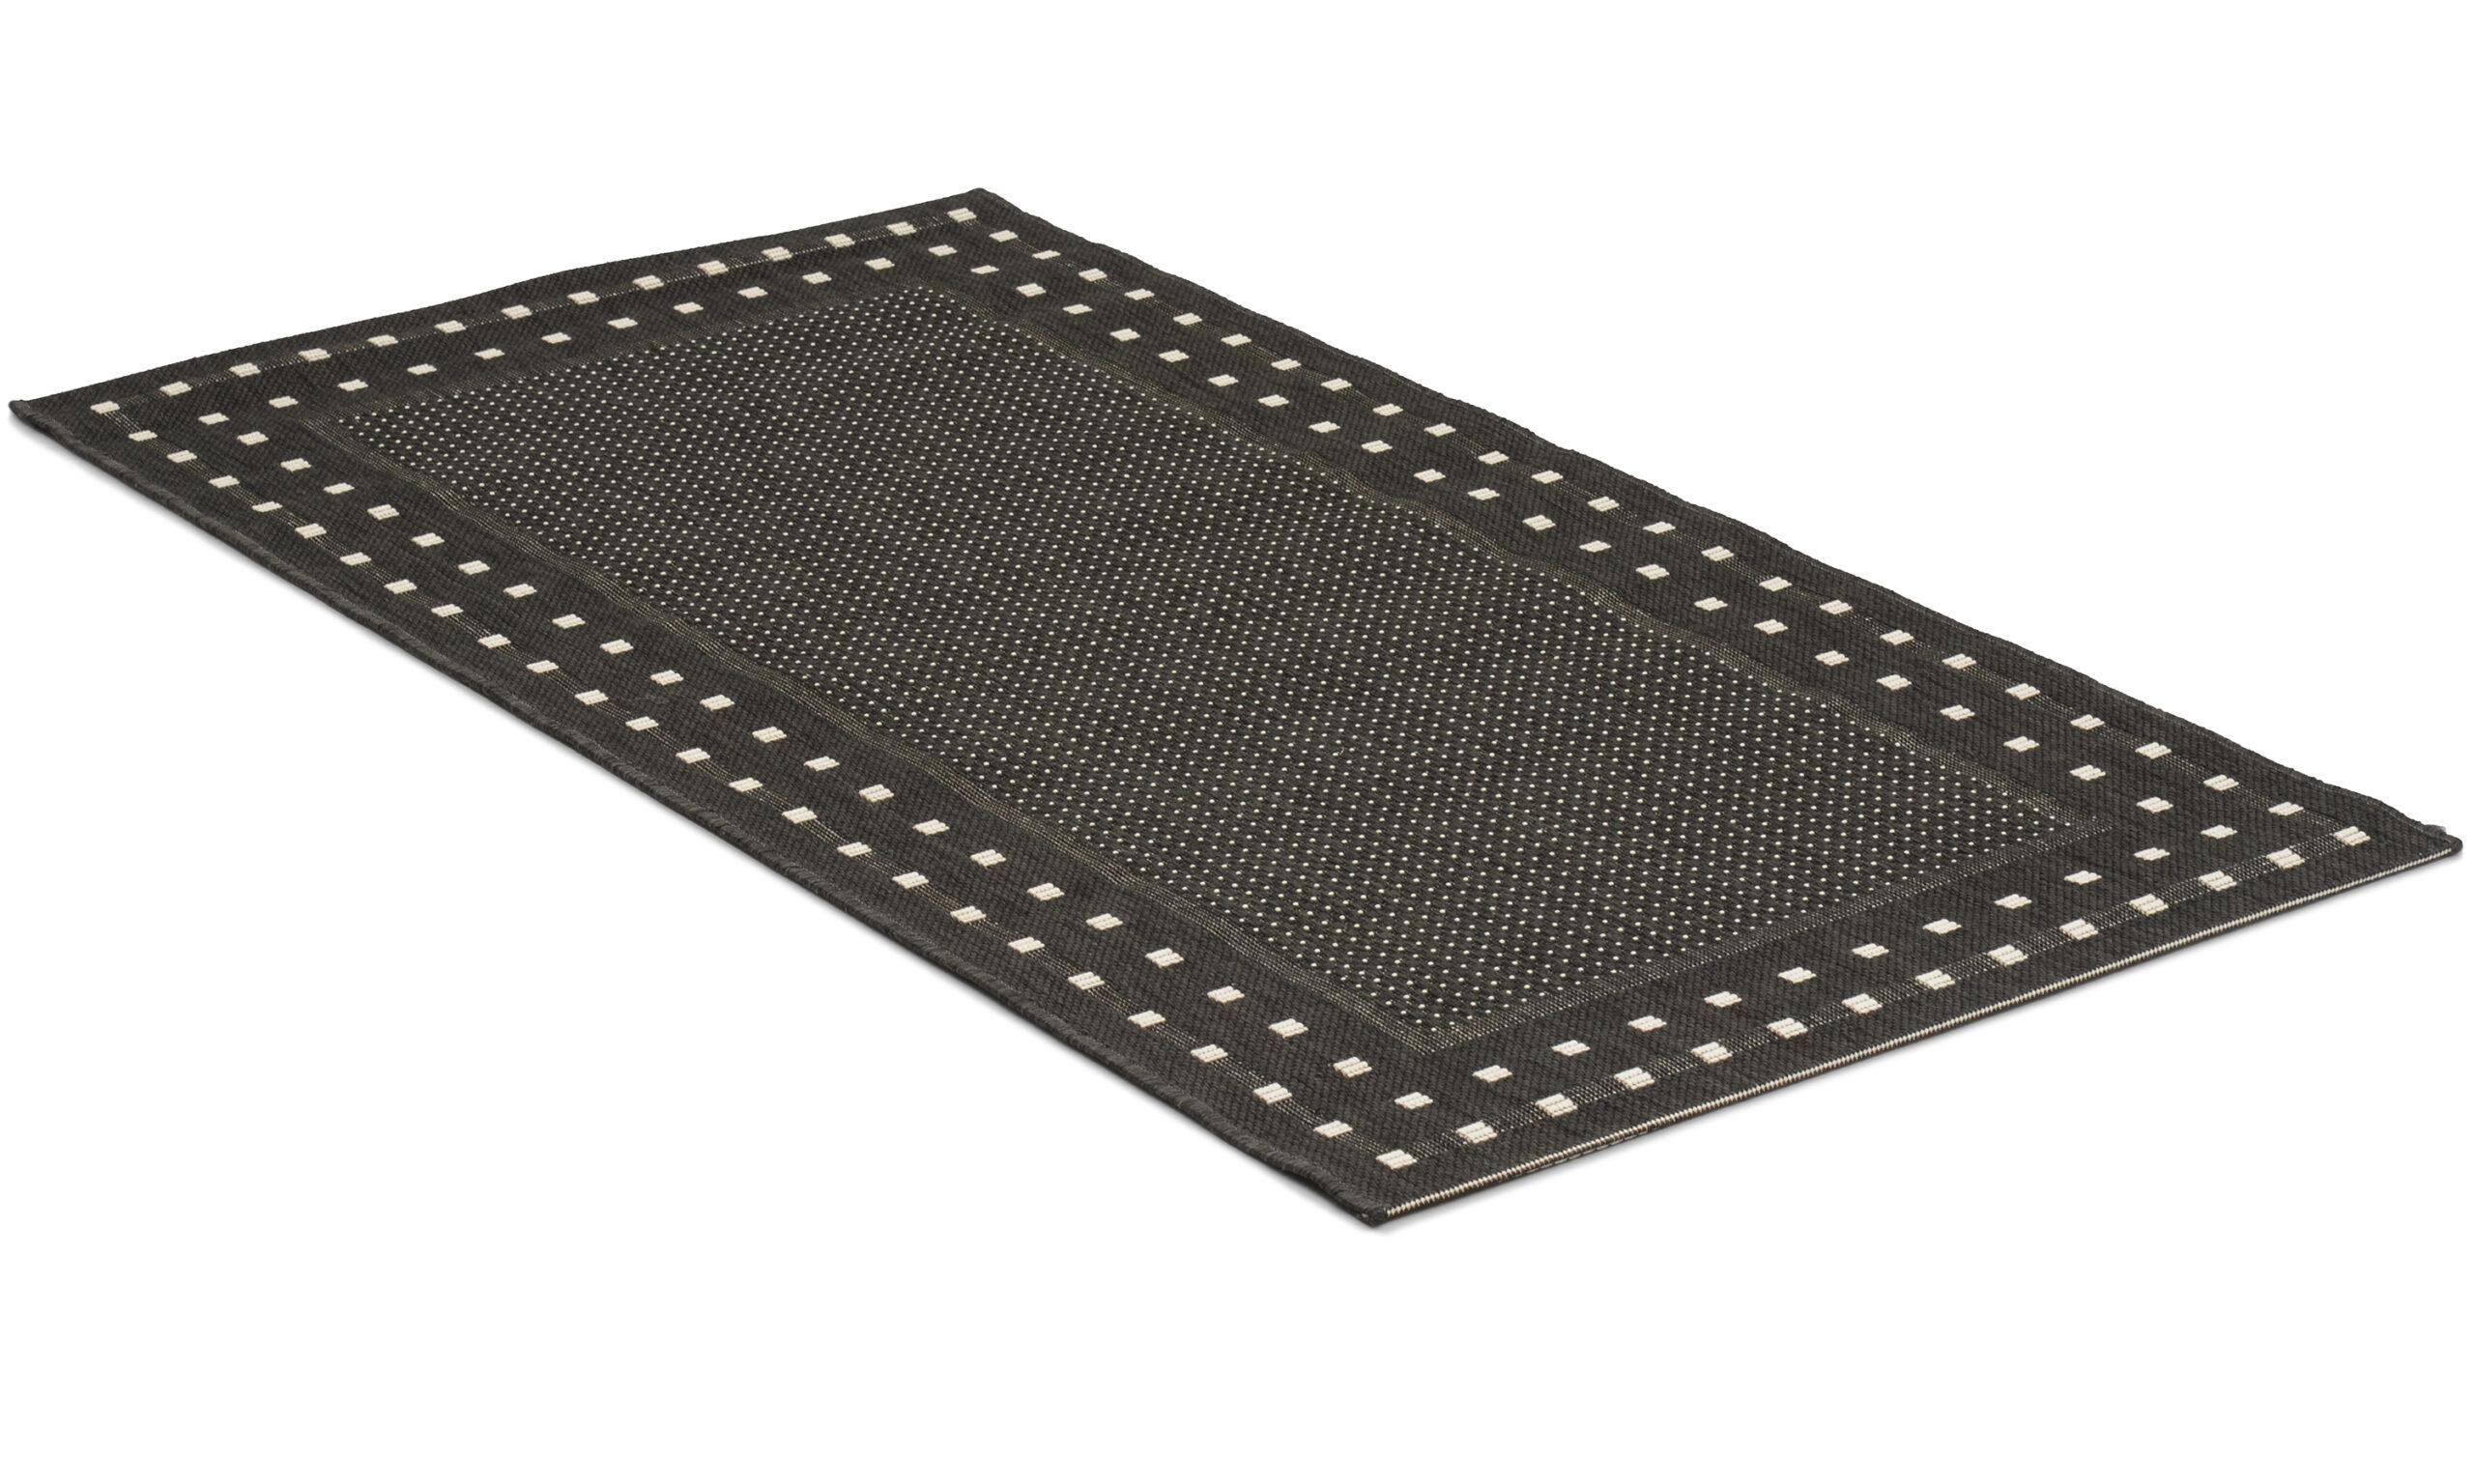 Rut svart - flatvevd teppe